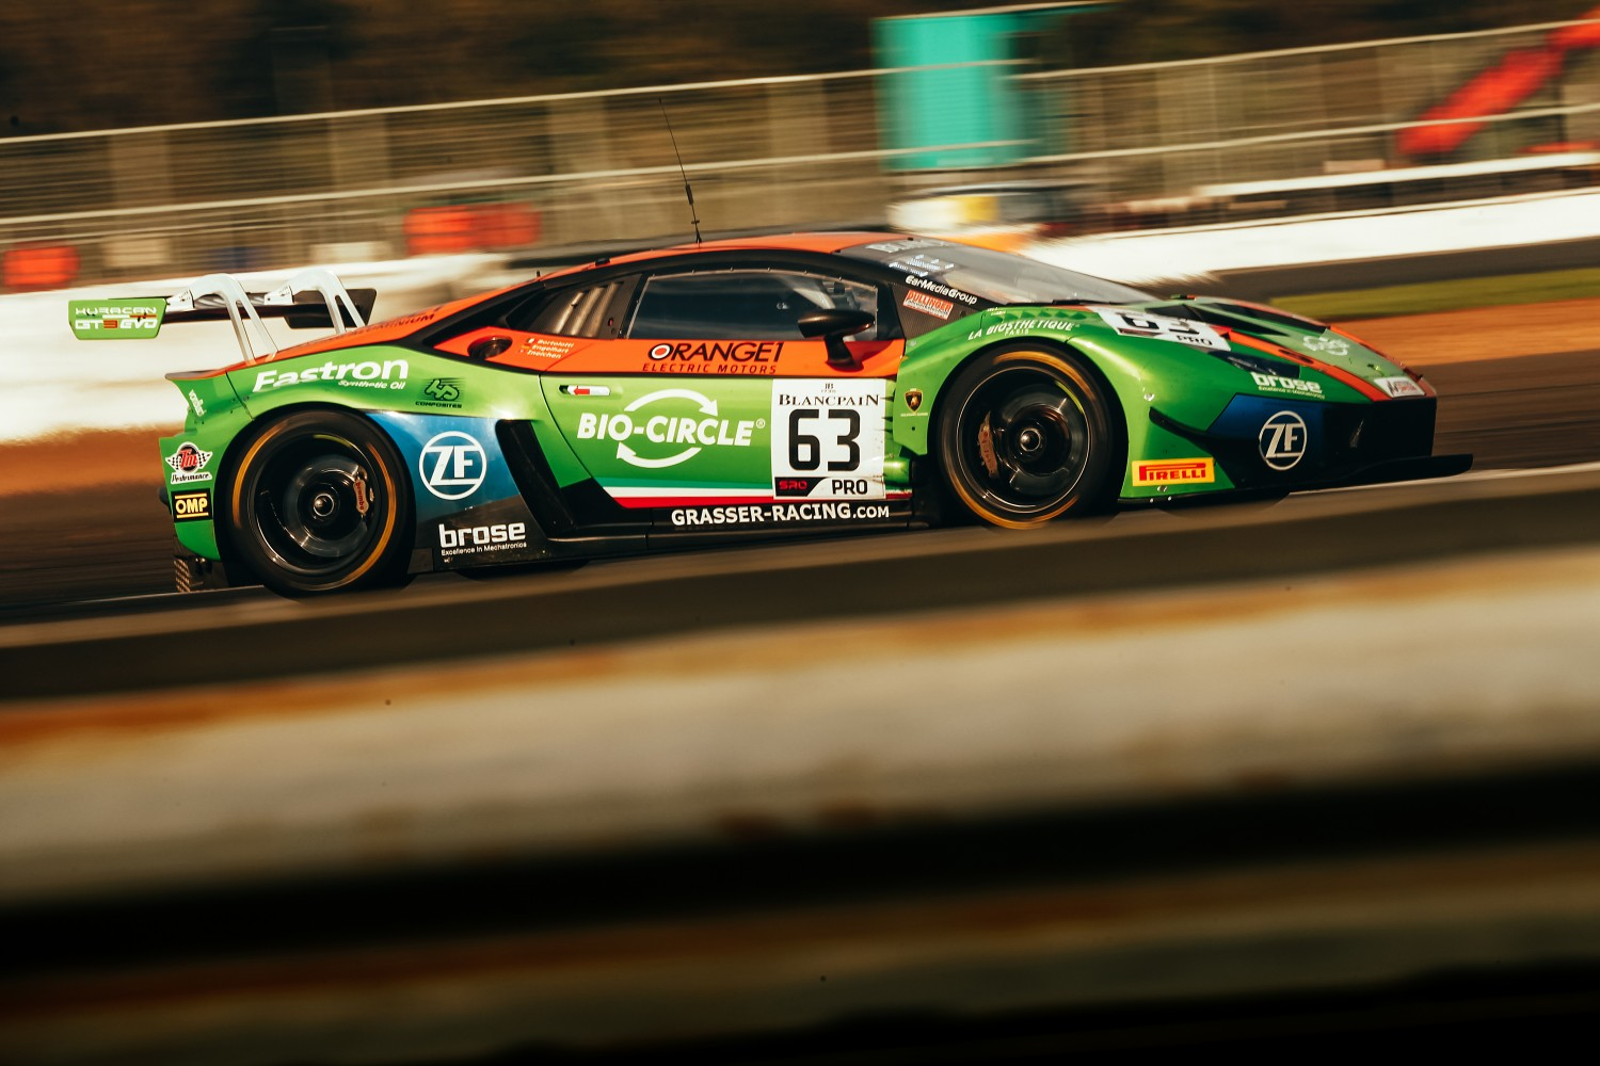 Grasser Lamborghini hits the front in pre-qualifying as Bortolotti sets the pace at Silverstone